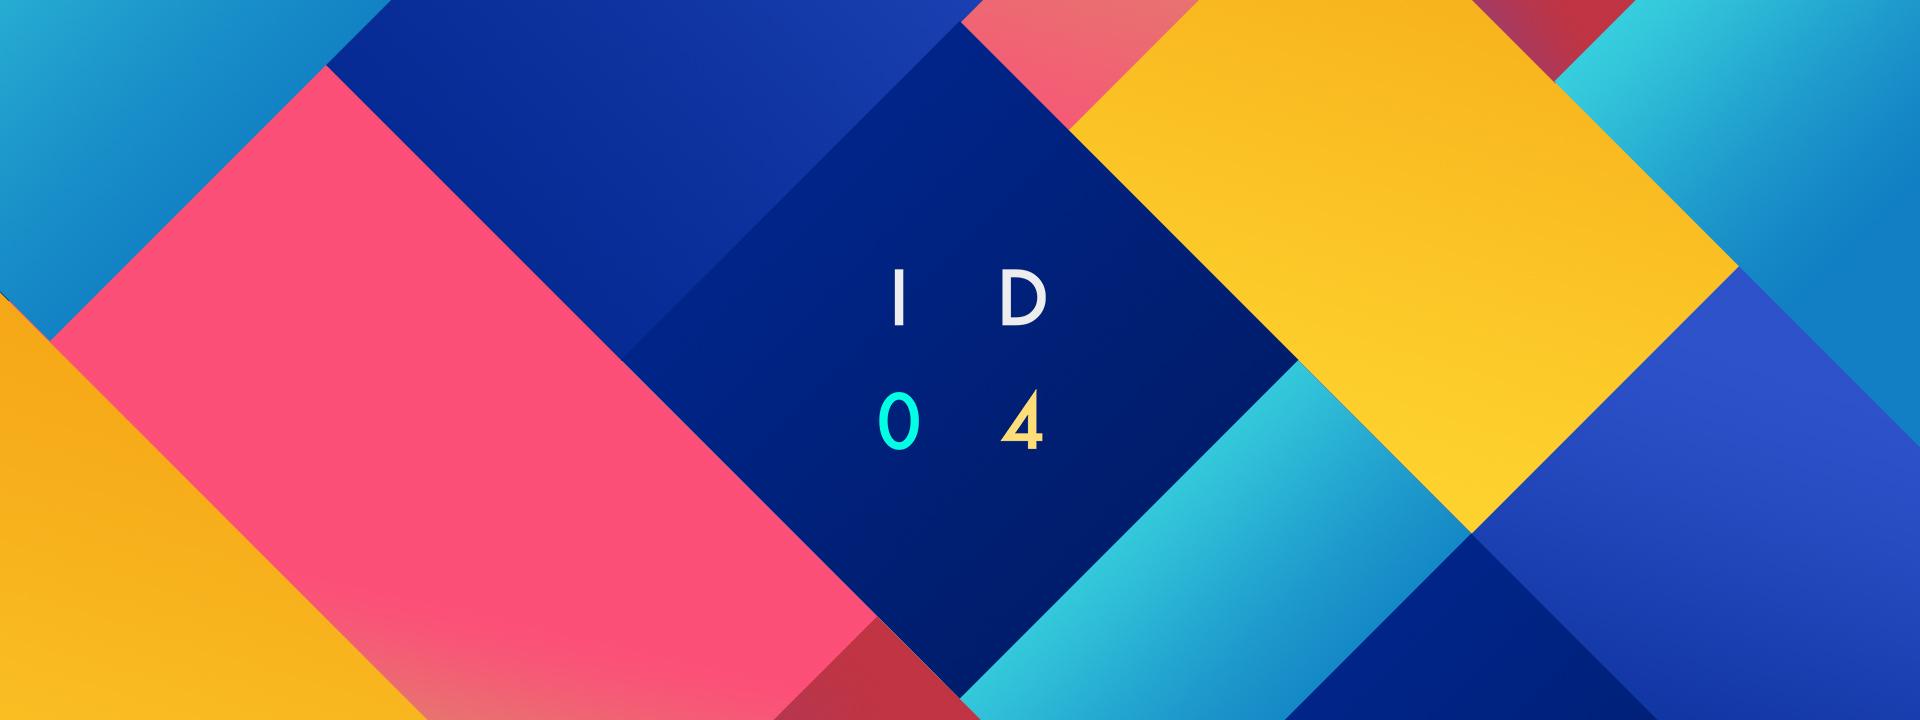 INNOVATION DAYS 04 – #ID04